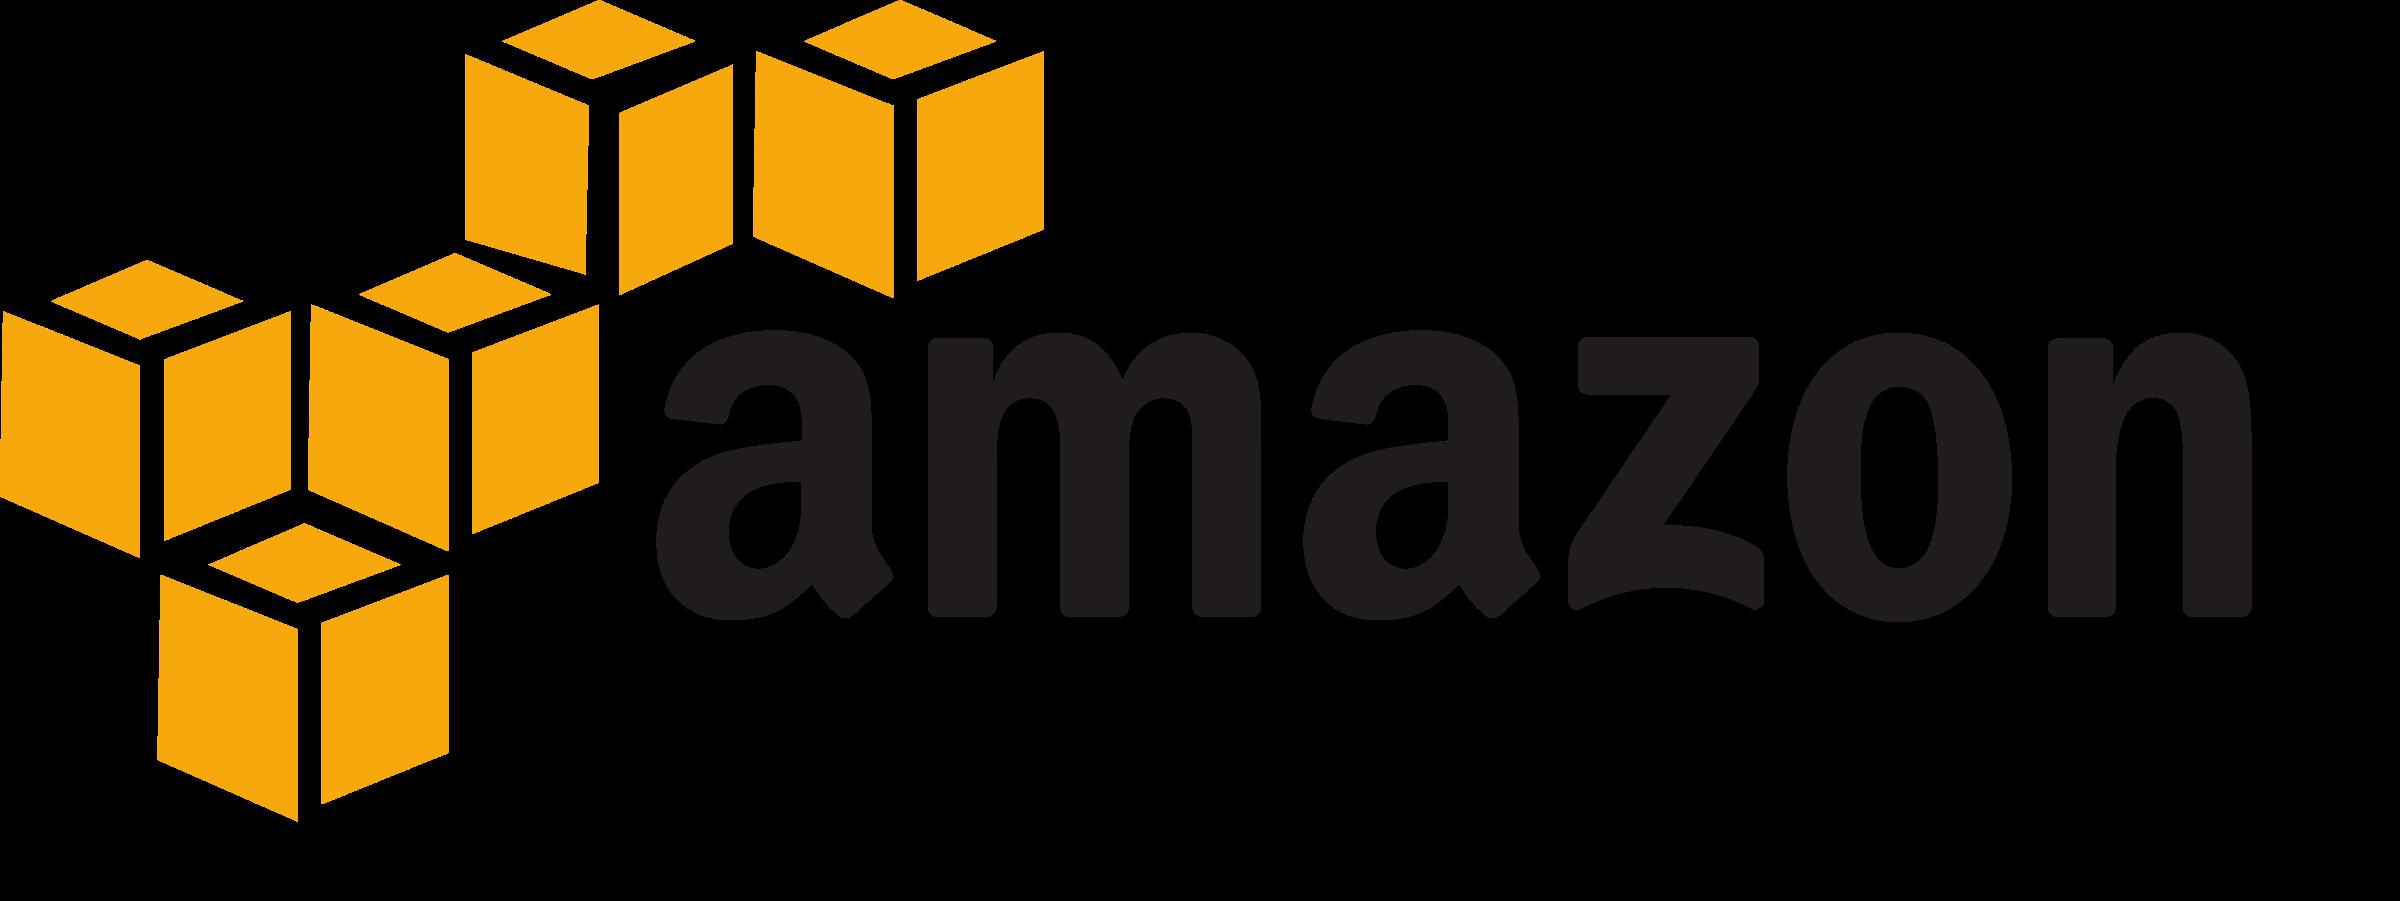 Amazon Web Services Logo PNG Transparent & SVG Vector - Freebie Supply